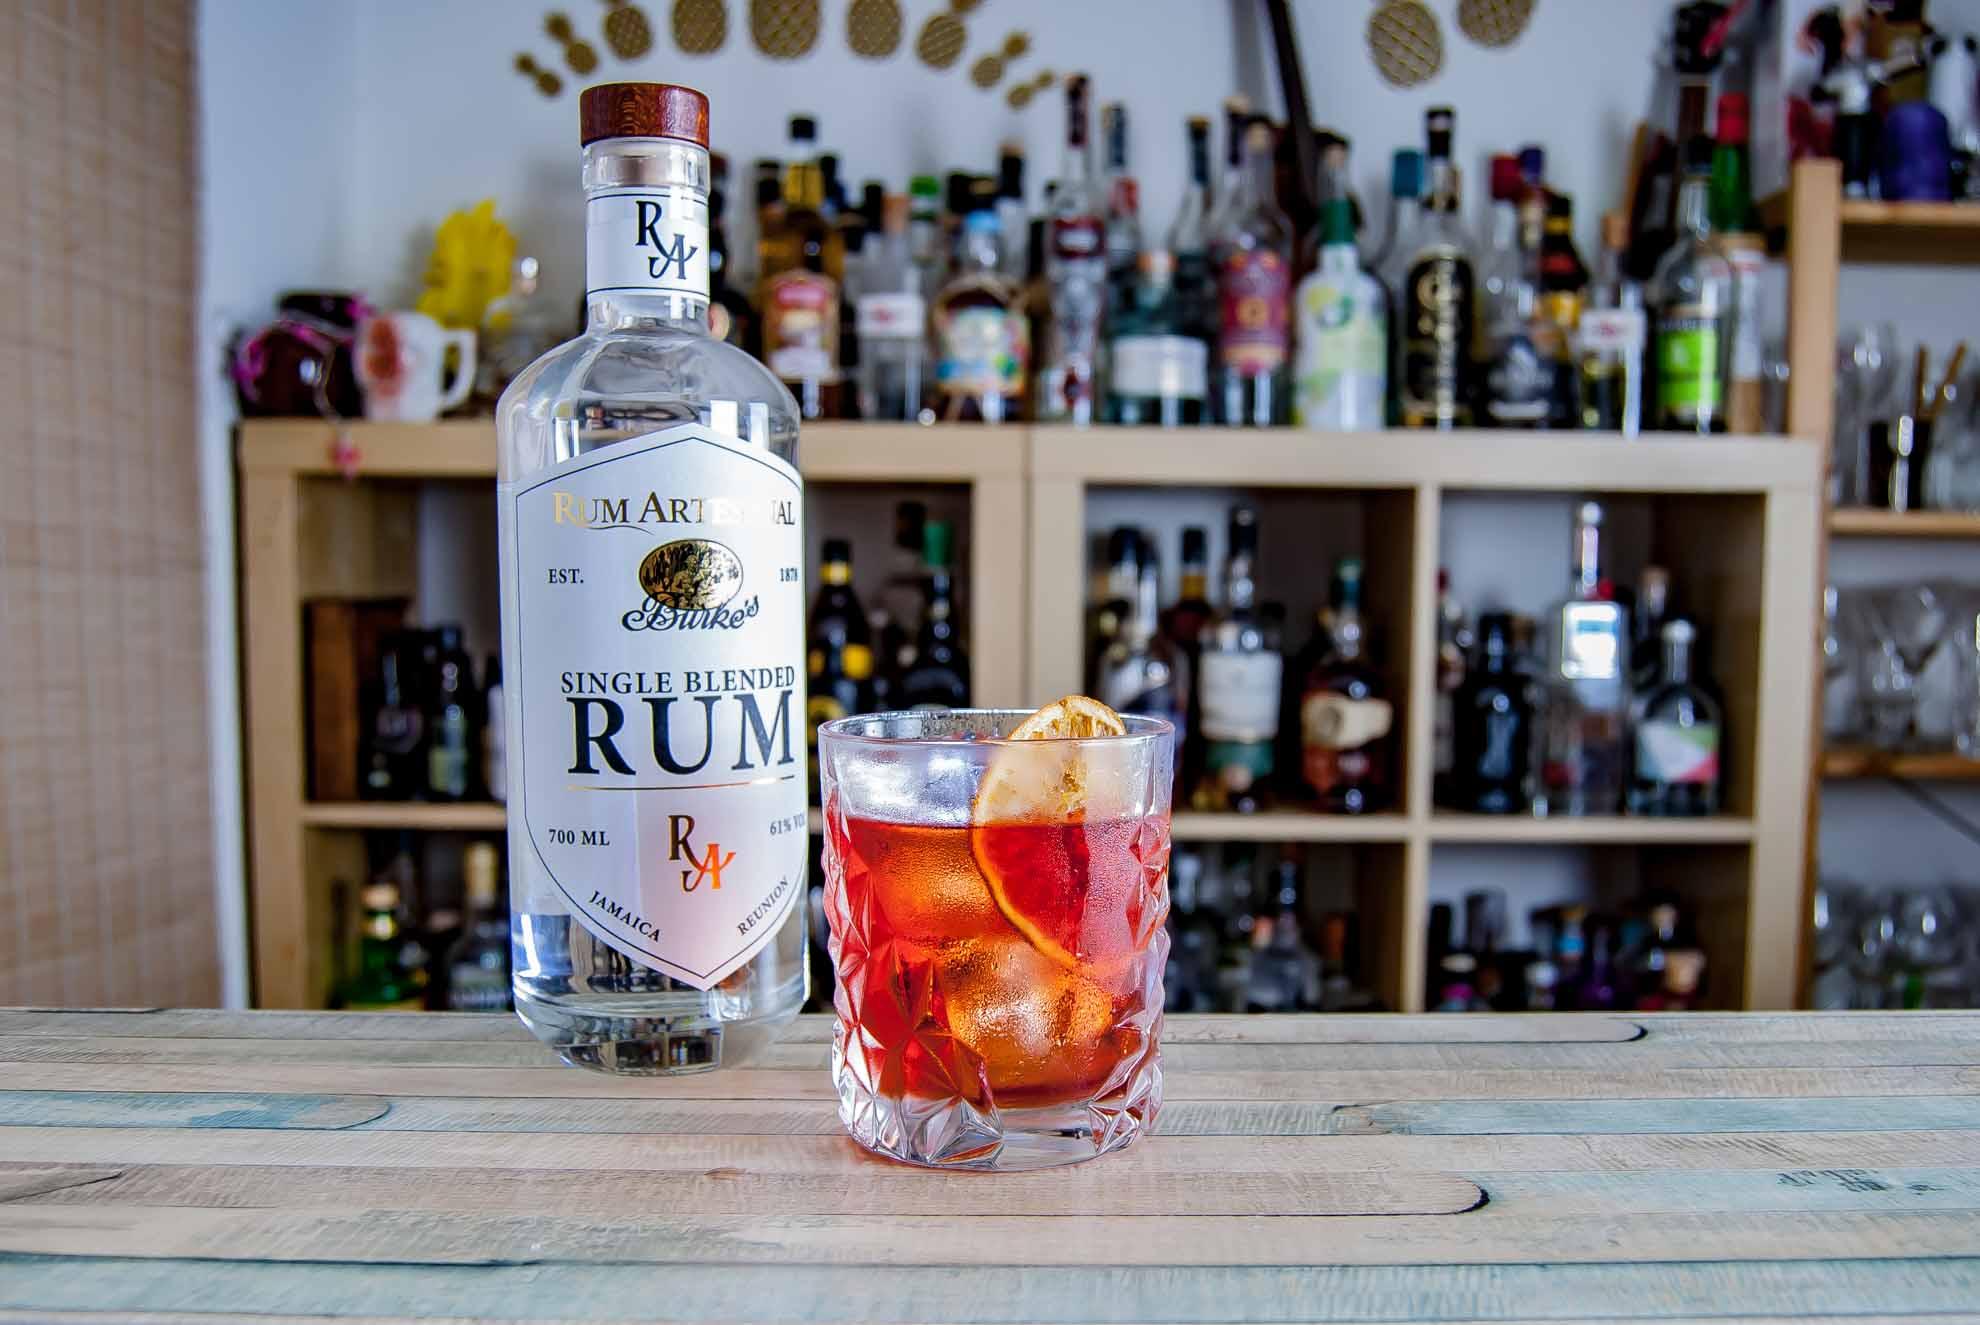 Ein East India Negroni mit Rum Artesanal Burke's White Single Blended Rum.